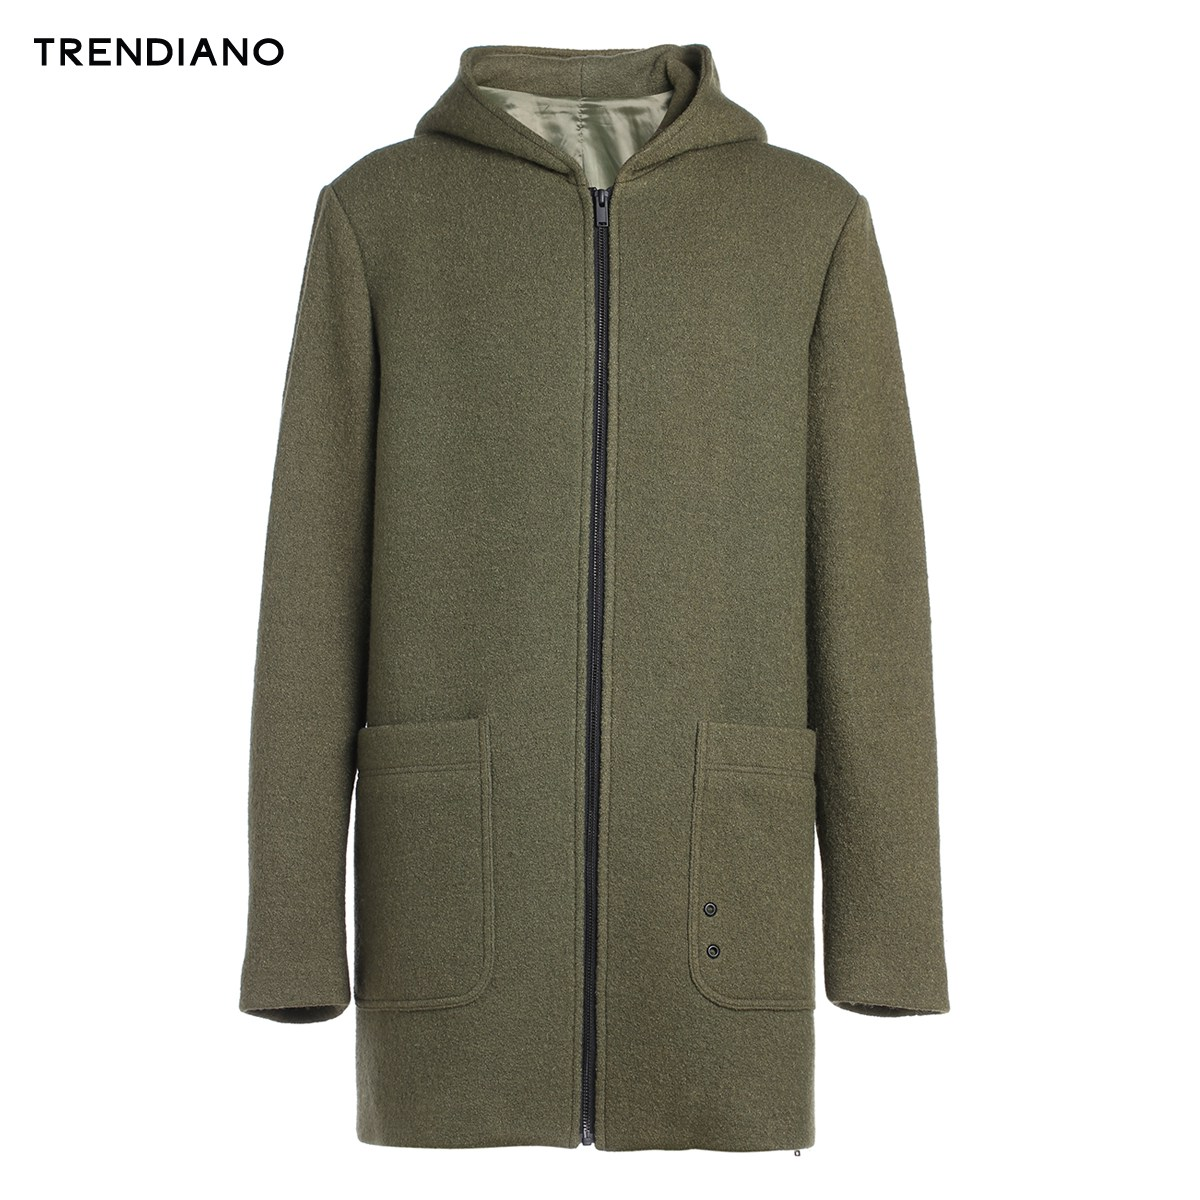 TRENDIANO新男装秋装中长款连帽纯色毛呢外套大衣外套3JC334606P